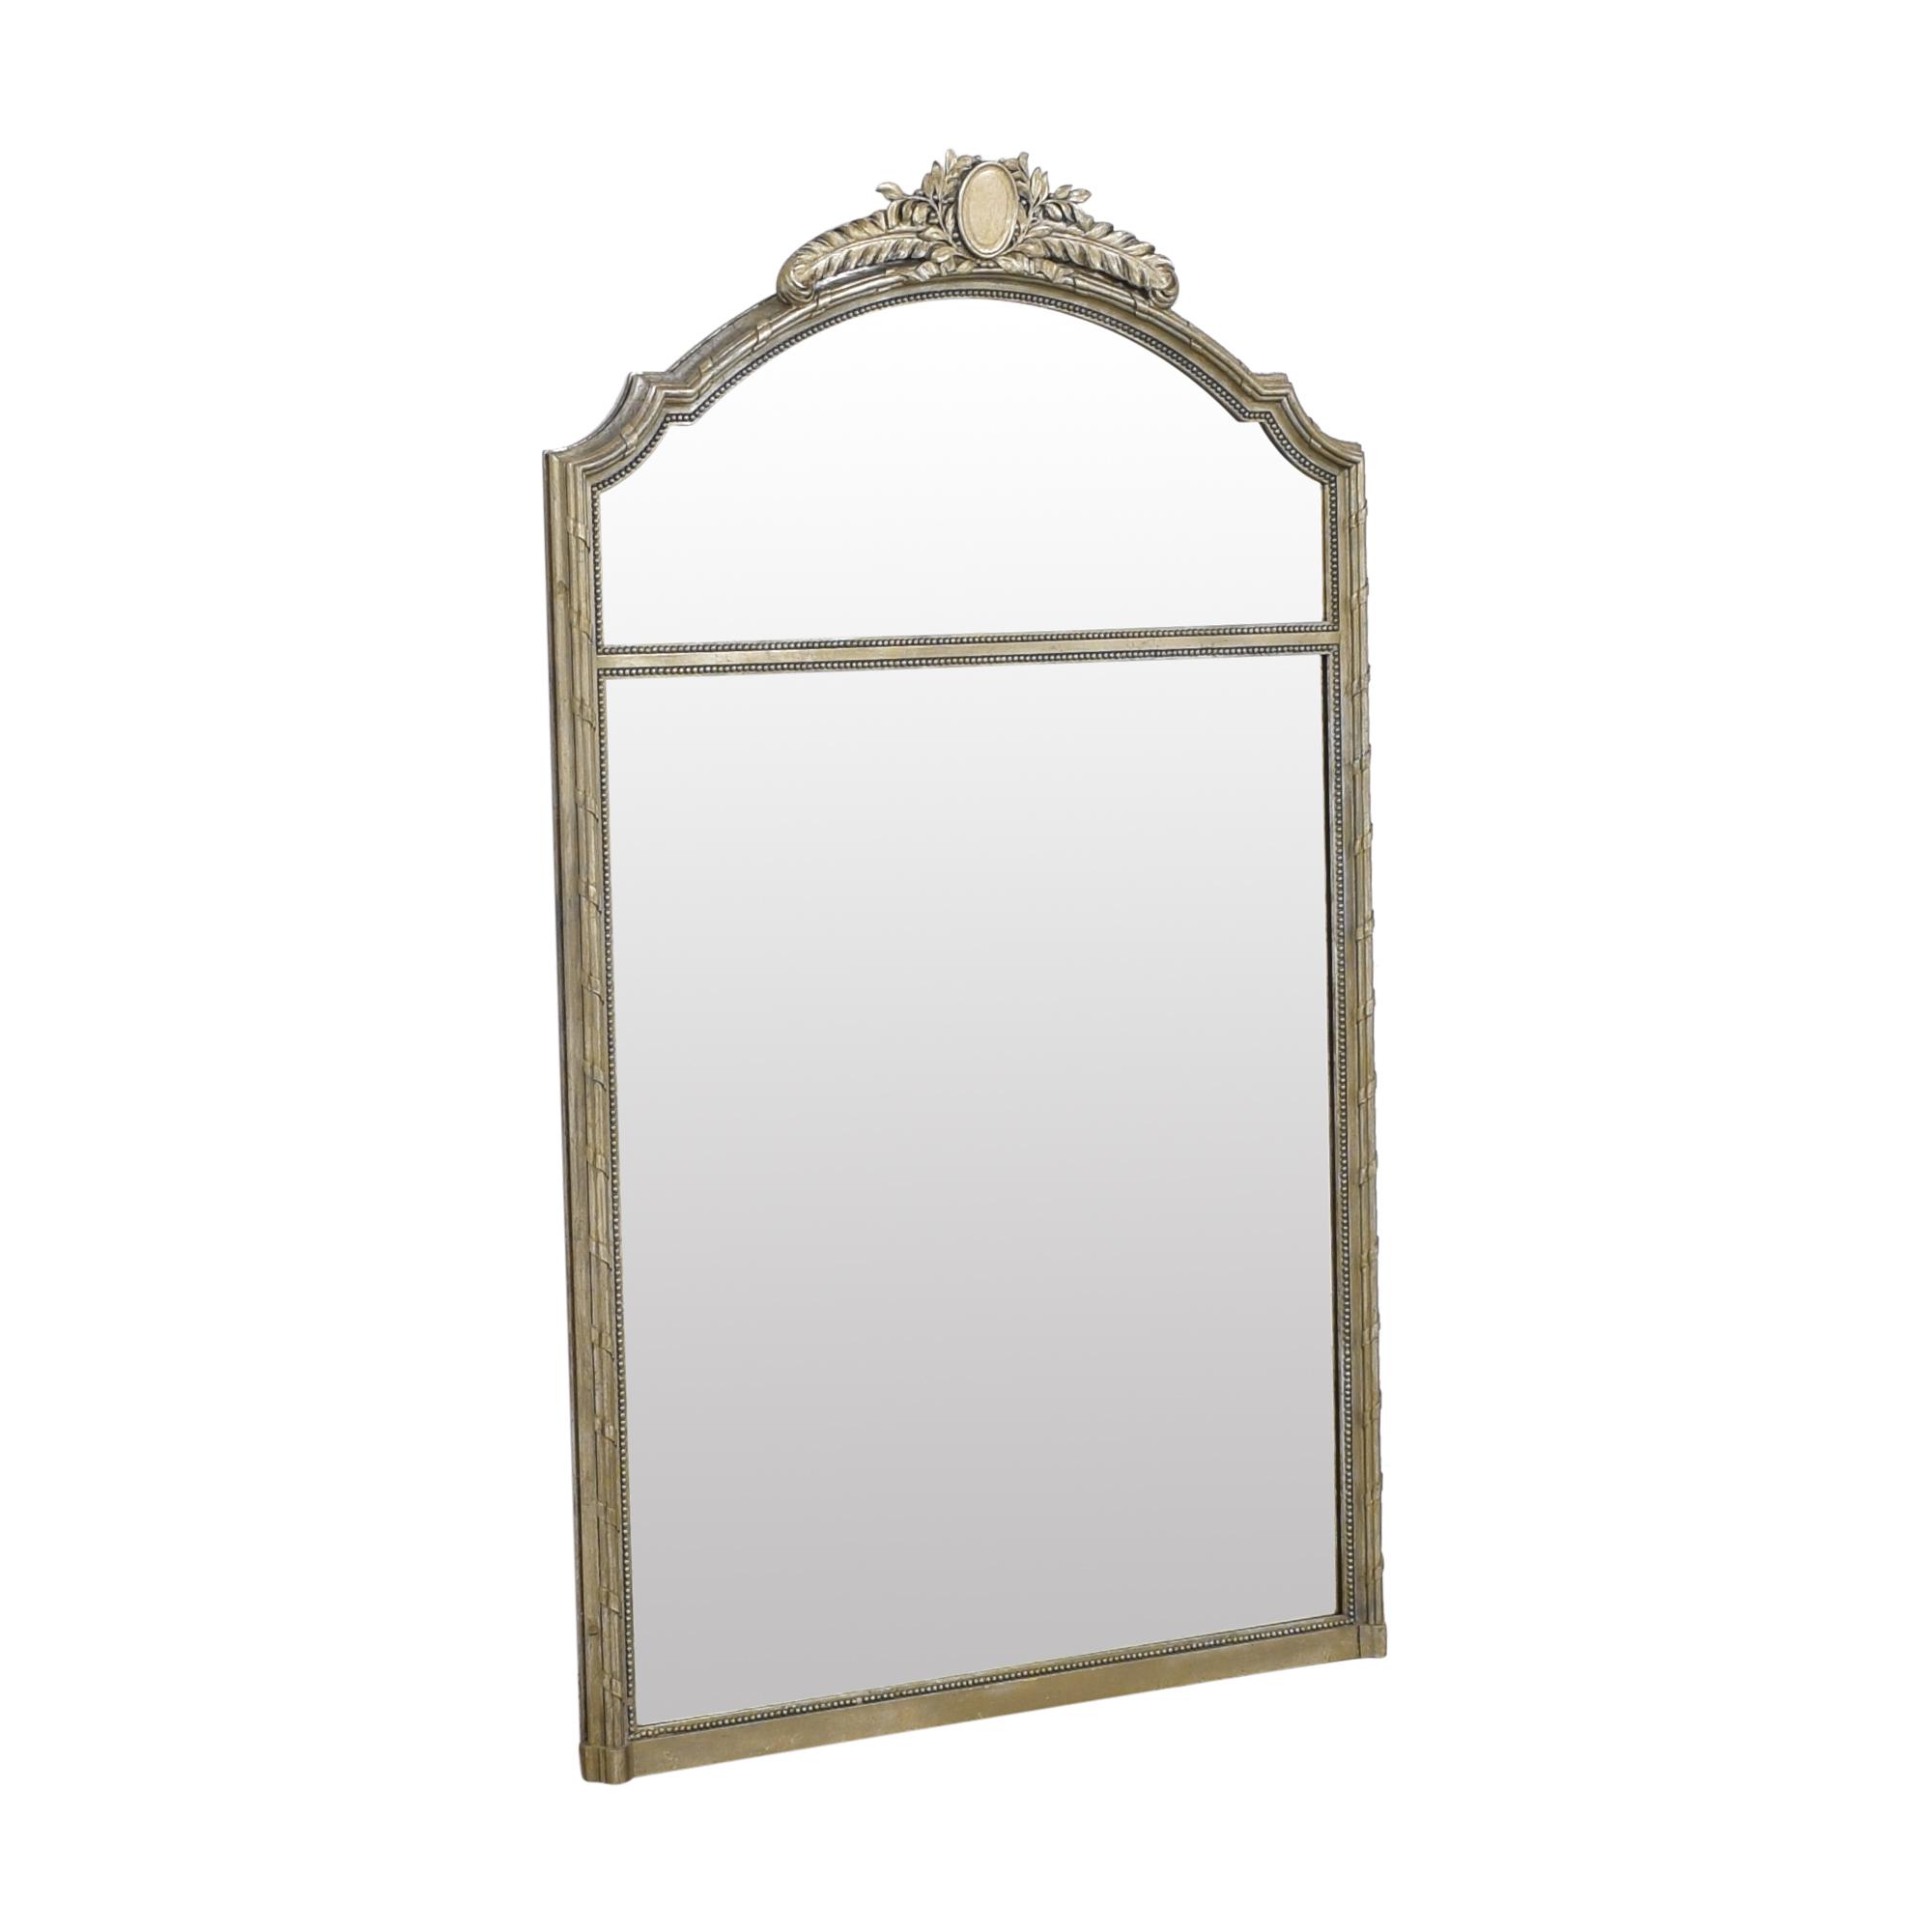 Decorative Wall Mirror nj